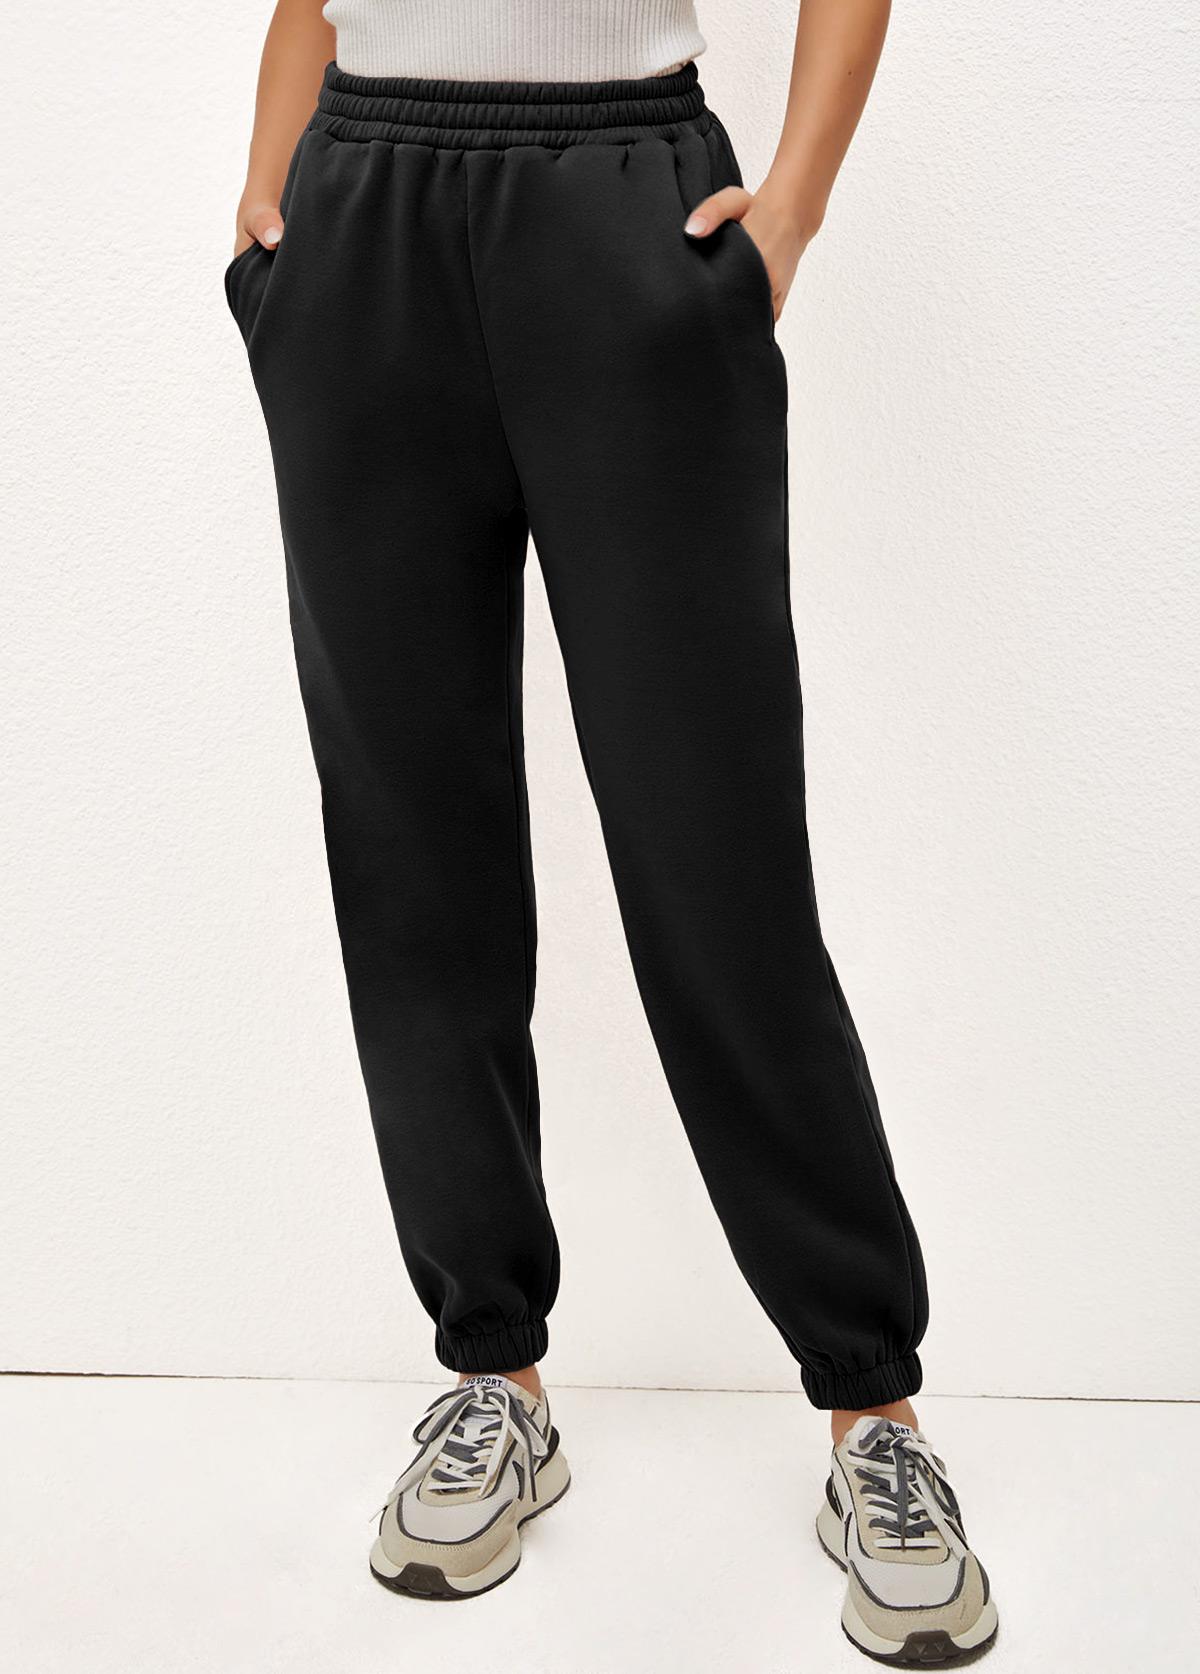 ROTITA Elastic Waist Solid Double Side Pockets Pants